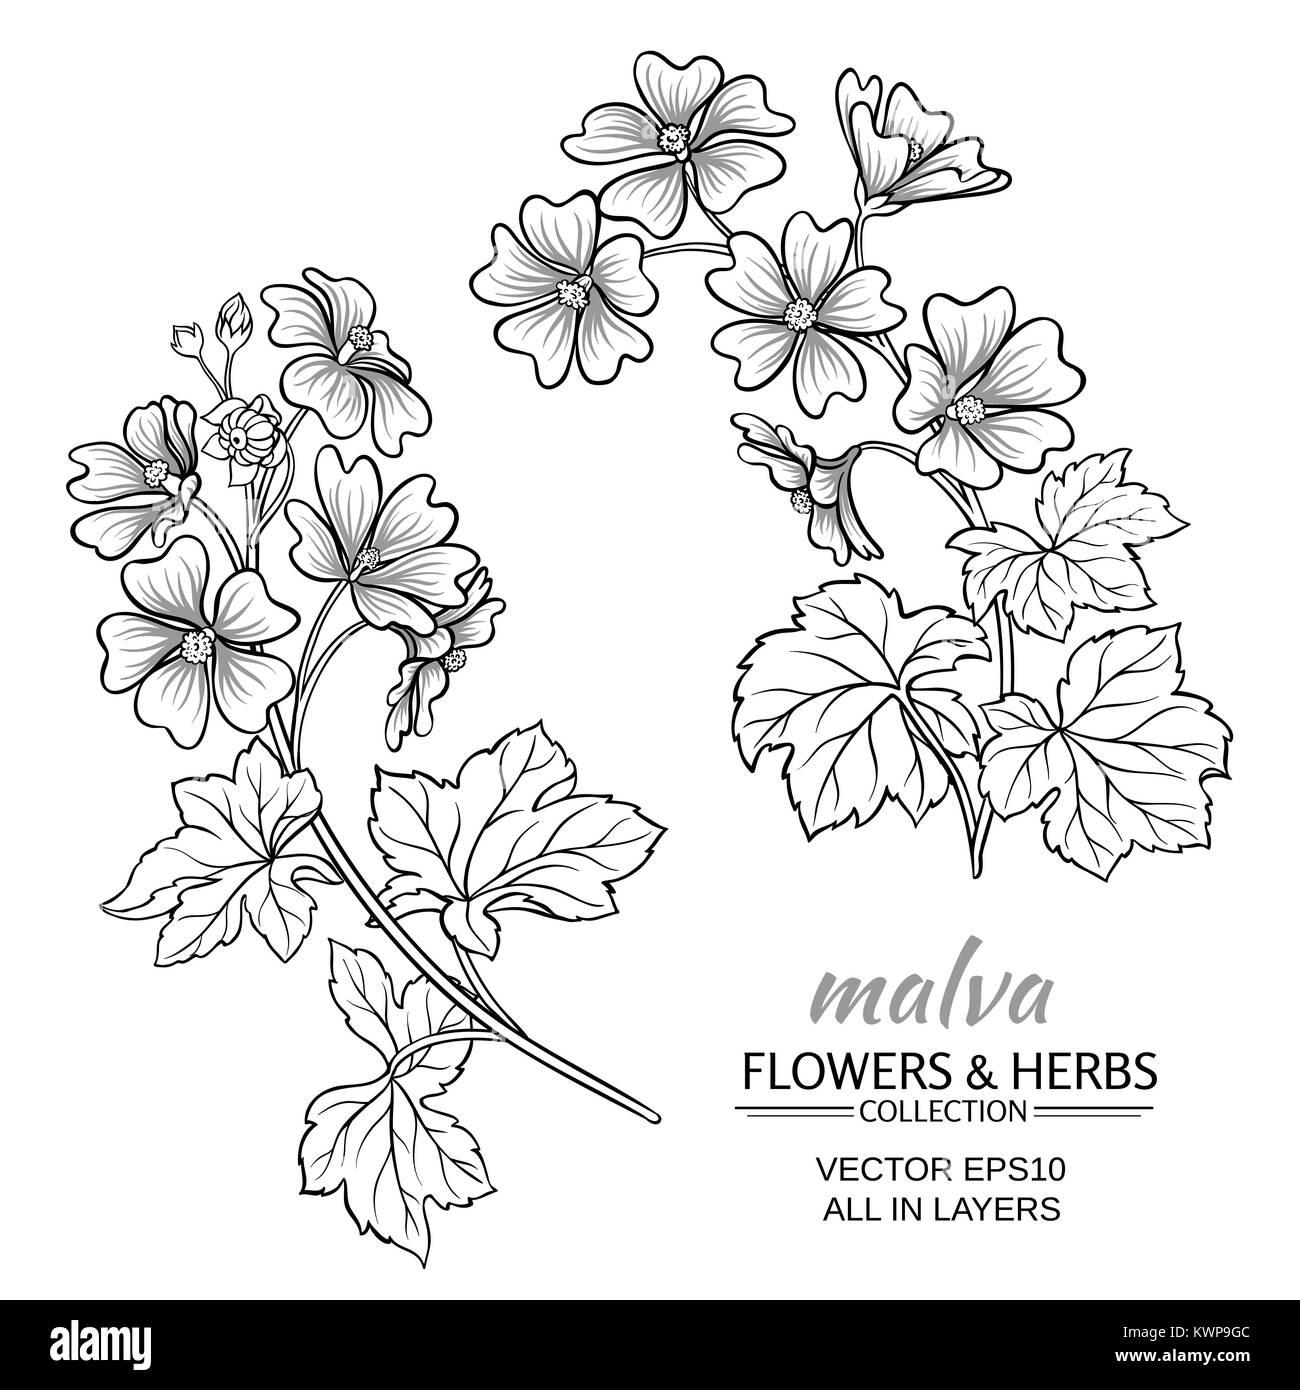 malva plant vector set on white background - Stock Image